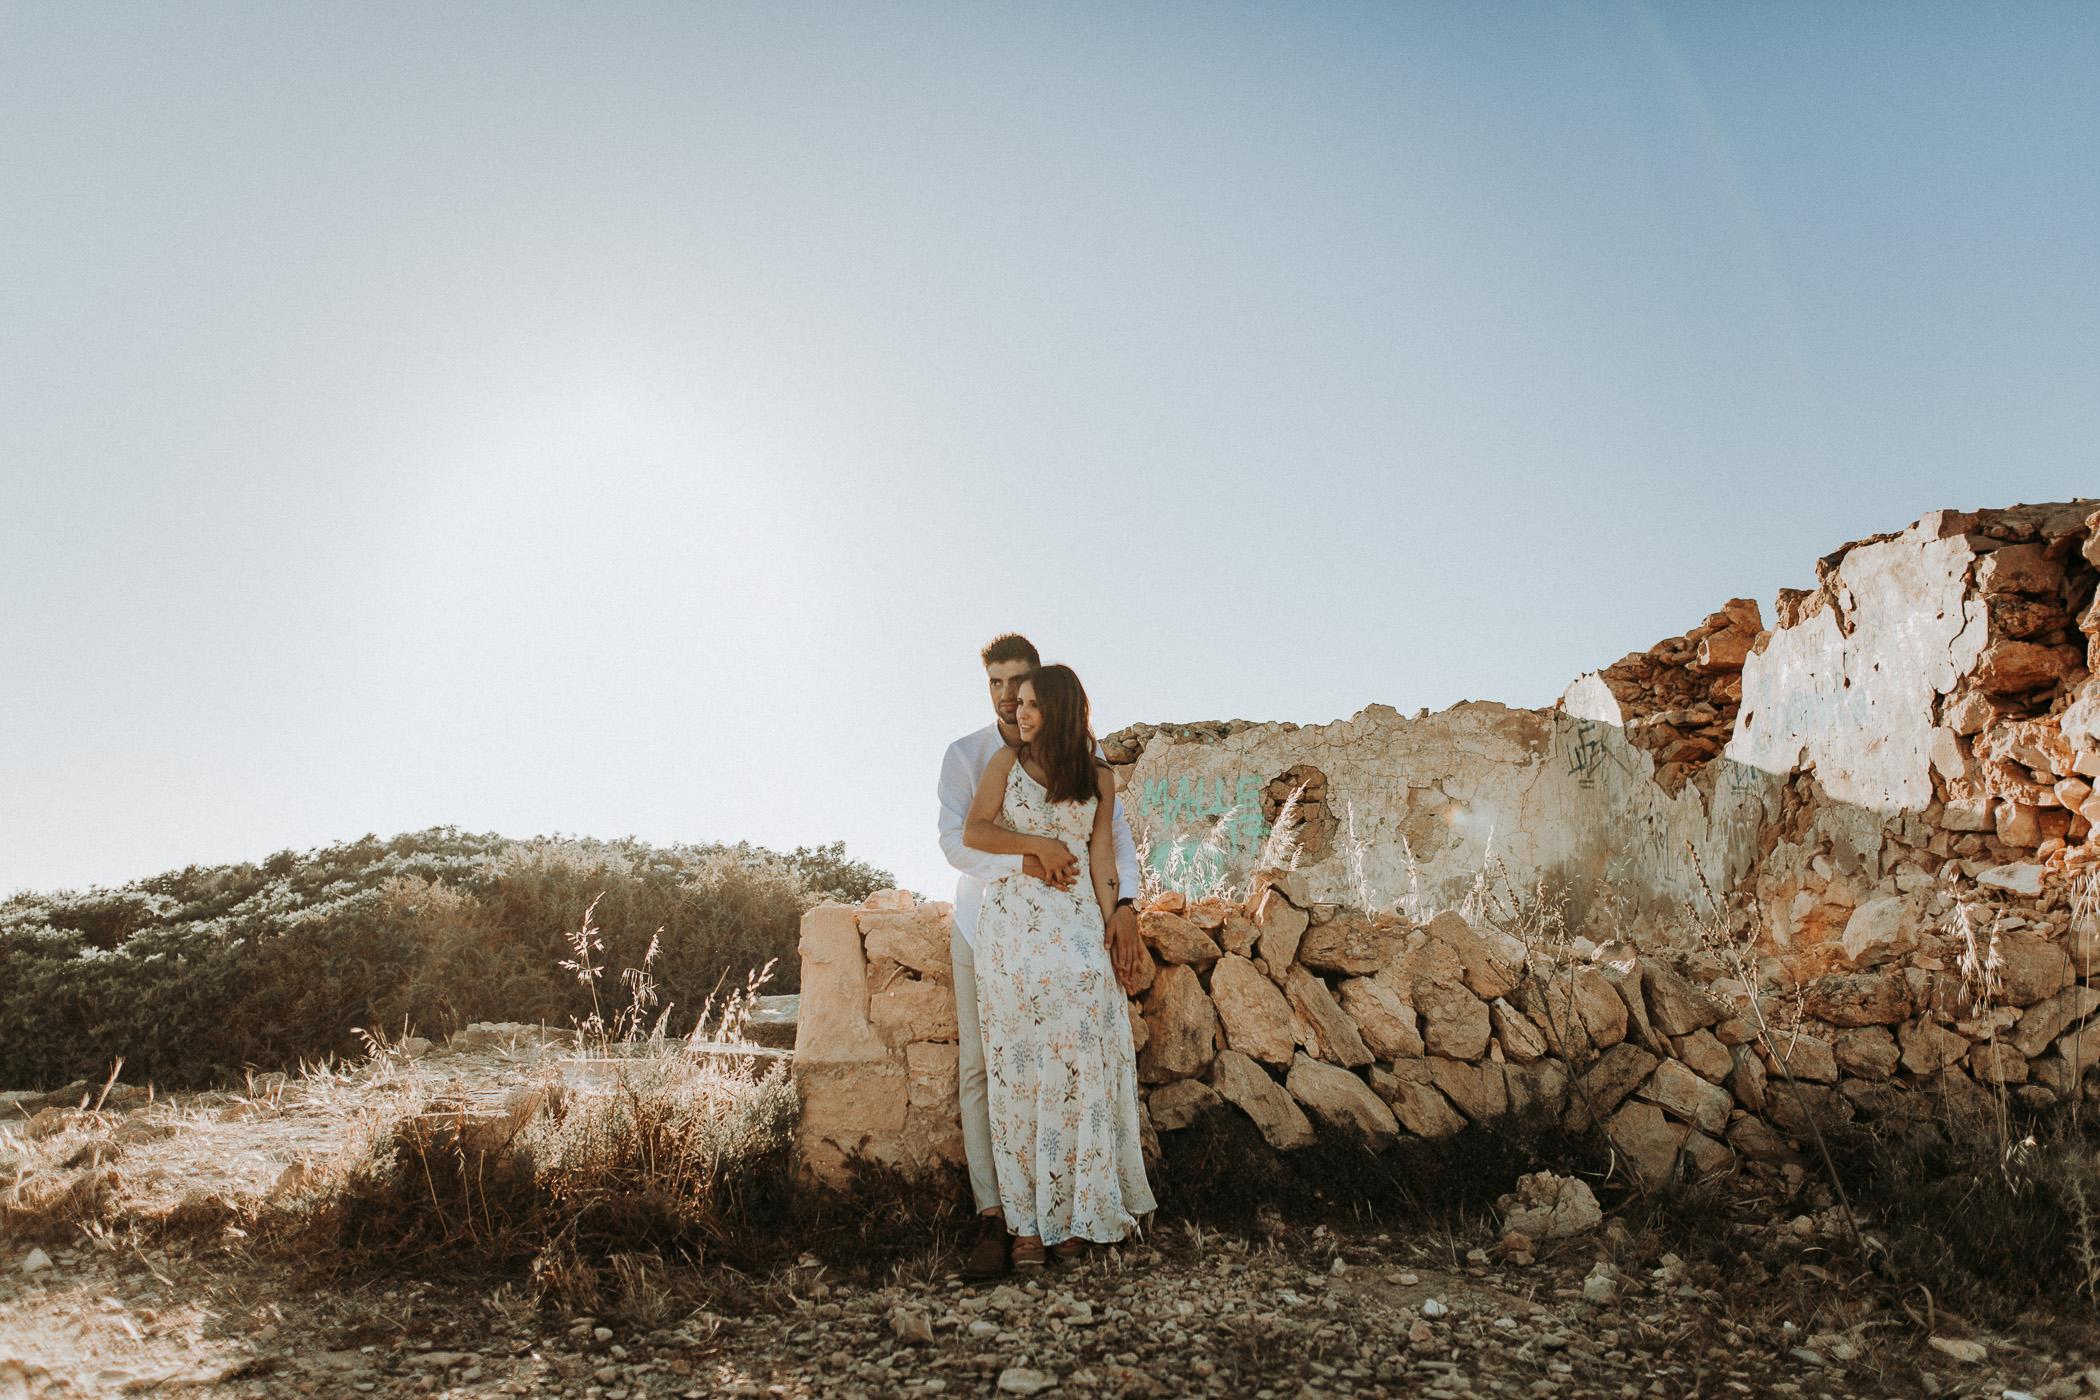 DanielaMarquardtPhotography_wedding_elopement_mallorca_spain_calapi_palma_lauraandtoni_375